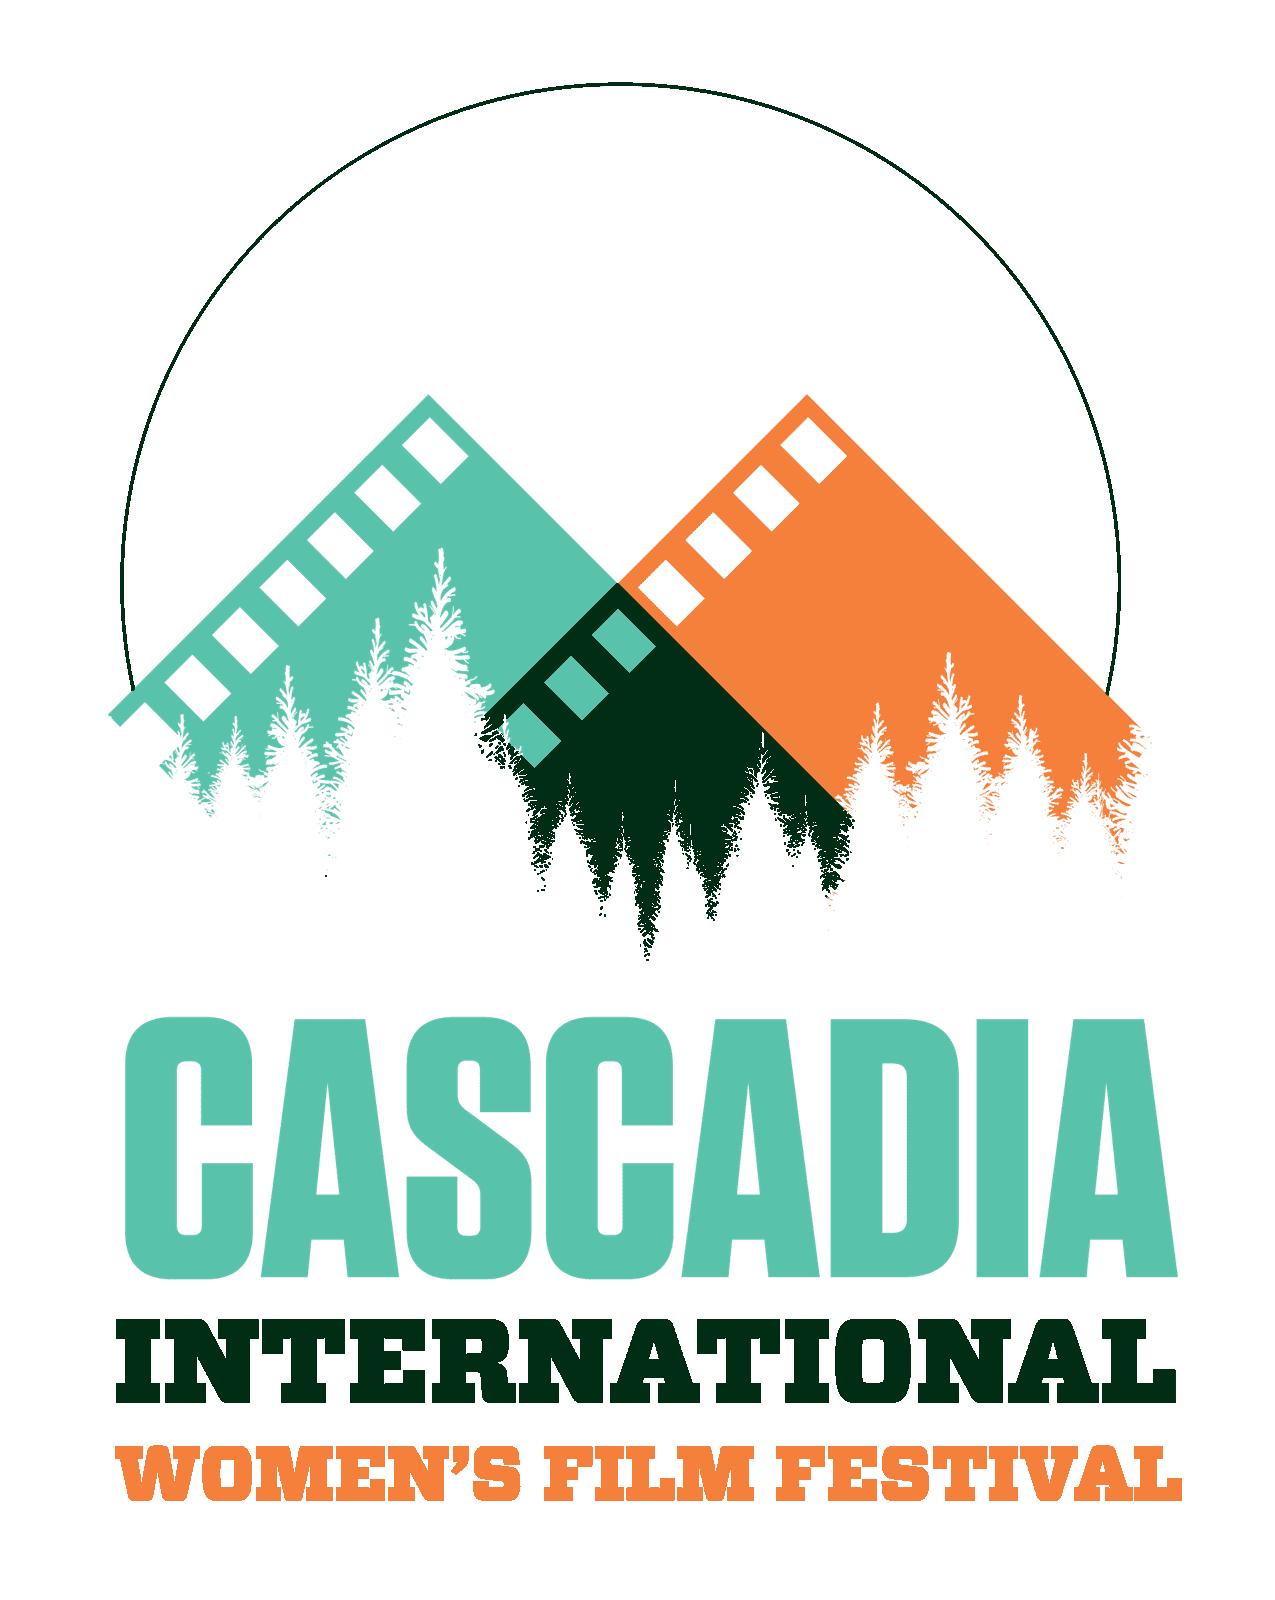 Cascadia Logo Bk Cheryl Crooks